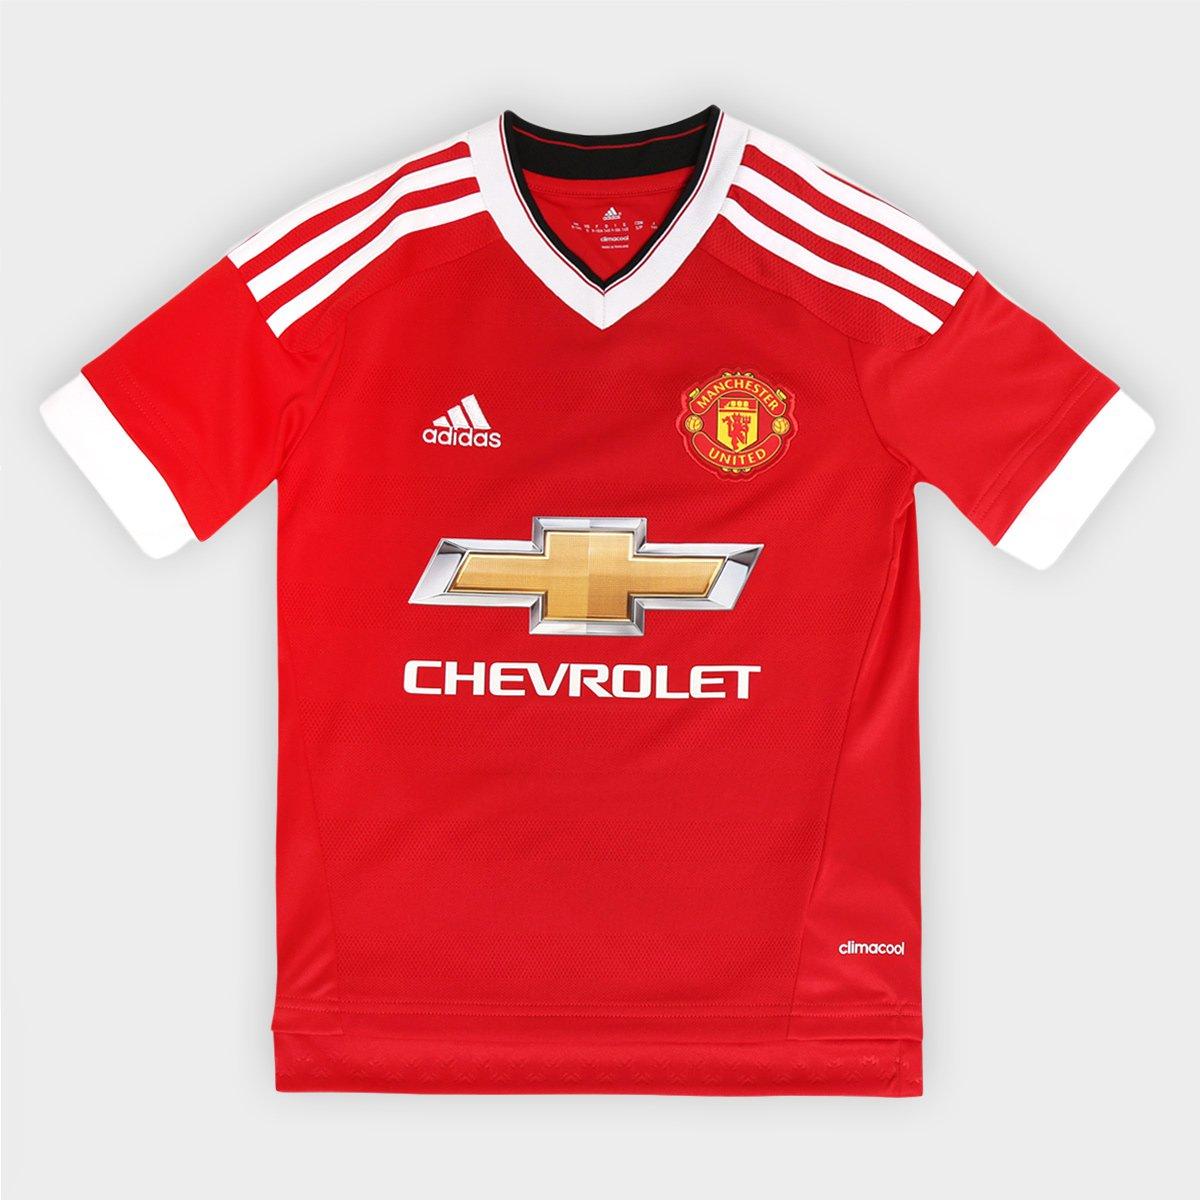 ... Camisa Adidas Manchester United Home 15 16 s nº Infantil - Compre Agora  Netshoes cc6cd7b65572cd ... 68d403a5c50a1